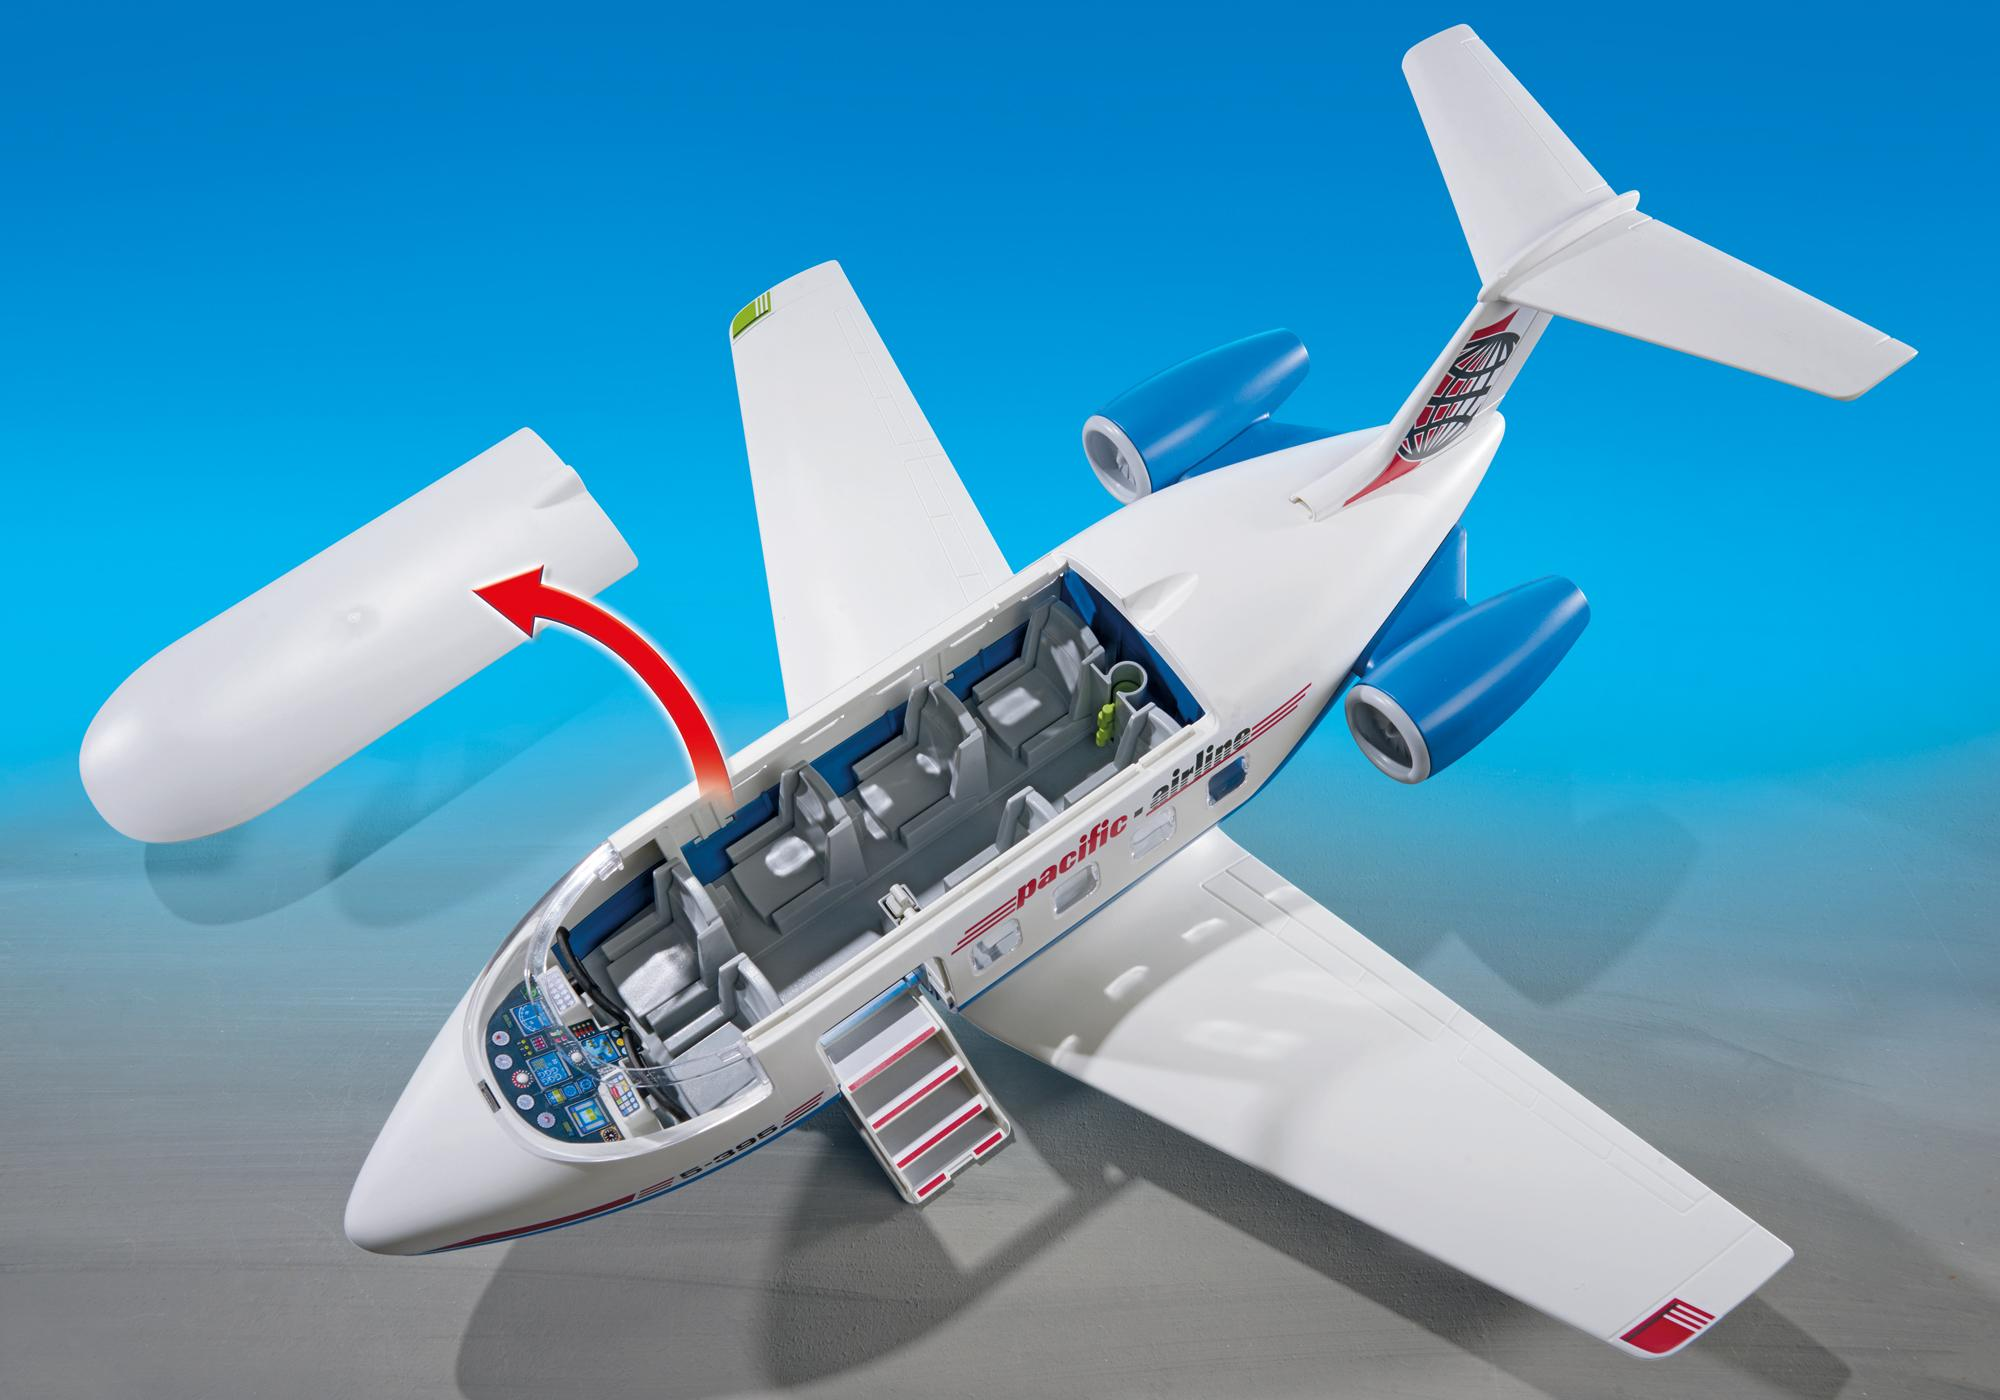 http://media.playmobil.com/i/playmobil/5395_product_extra3/Passenger Plane